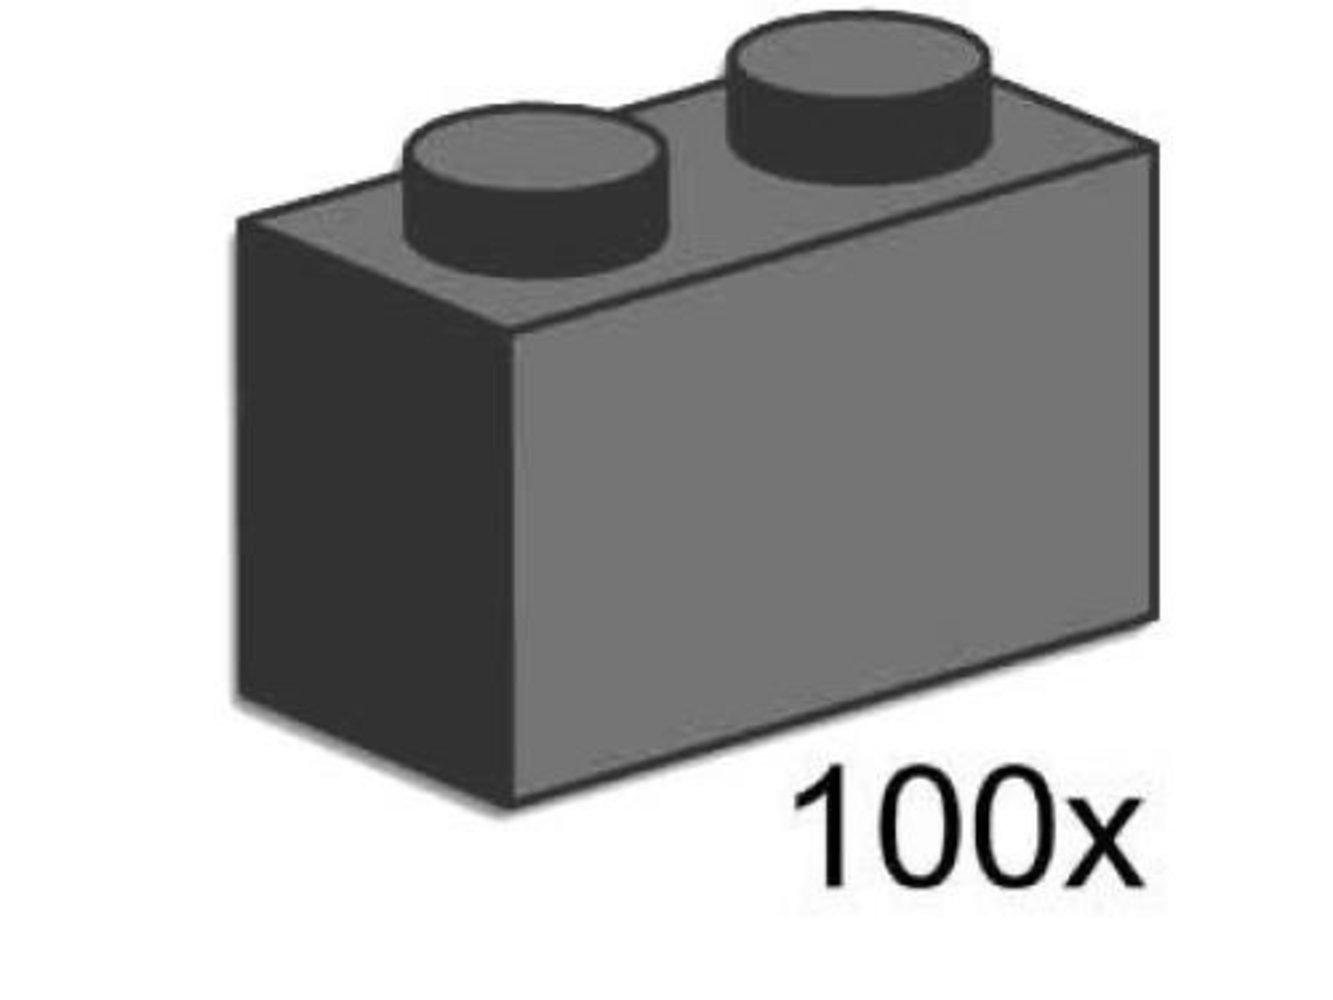 1 x 2 Brick Dark Gray